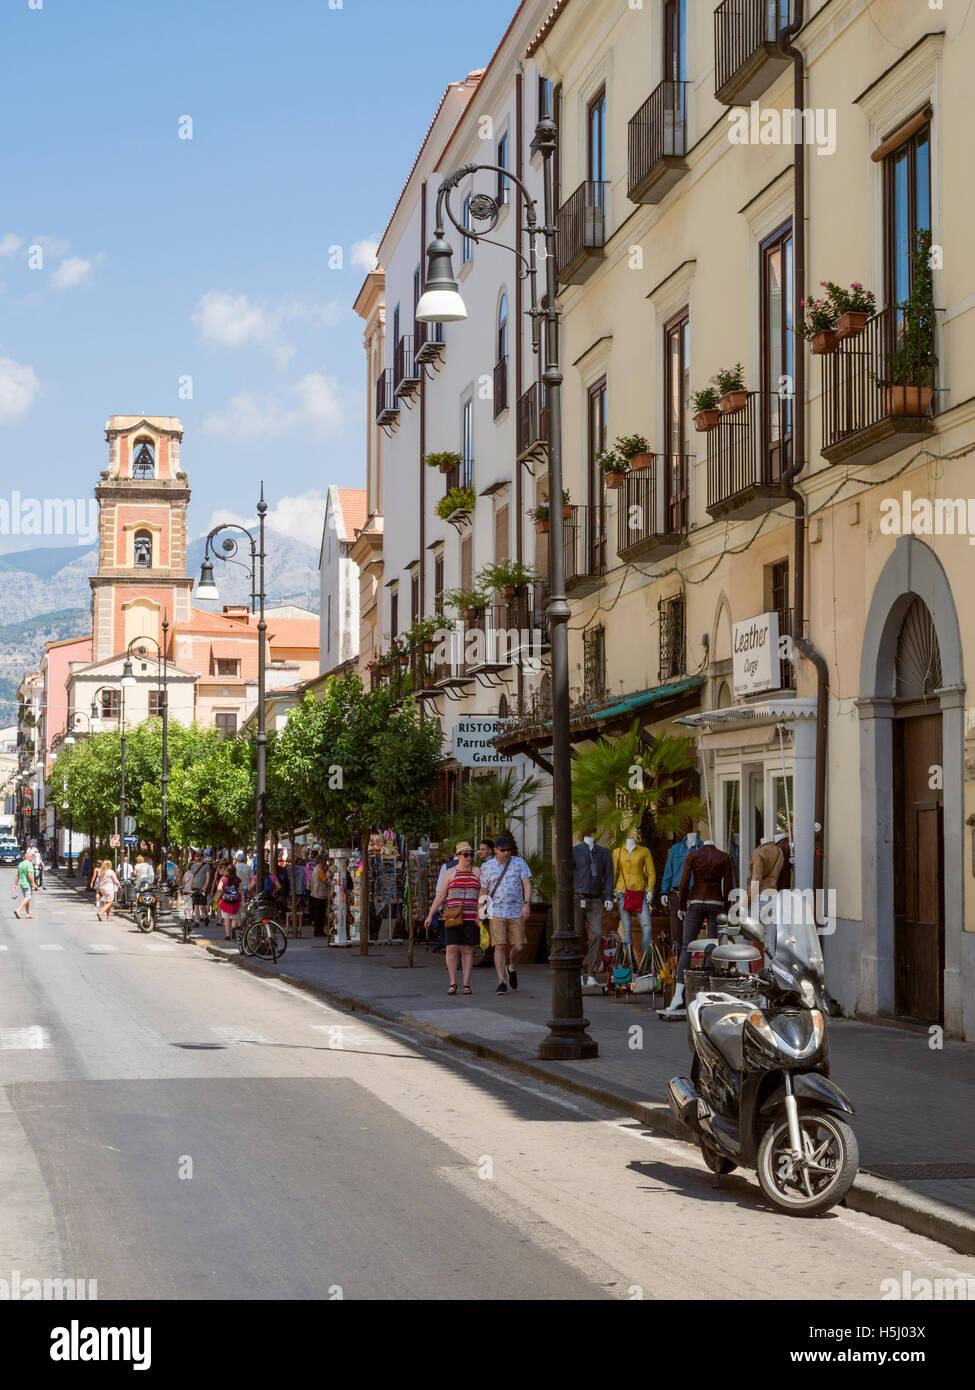 Vista a lo largo de Corsa Italia en Sorrento Italia Imagen De Stock